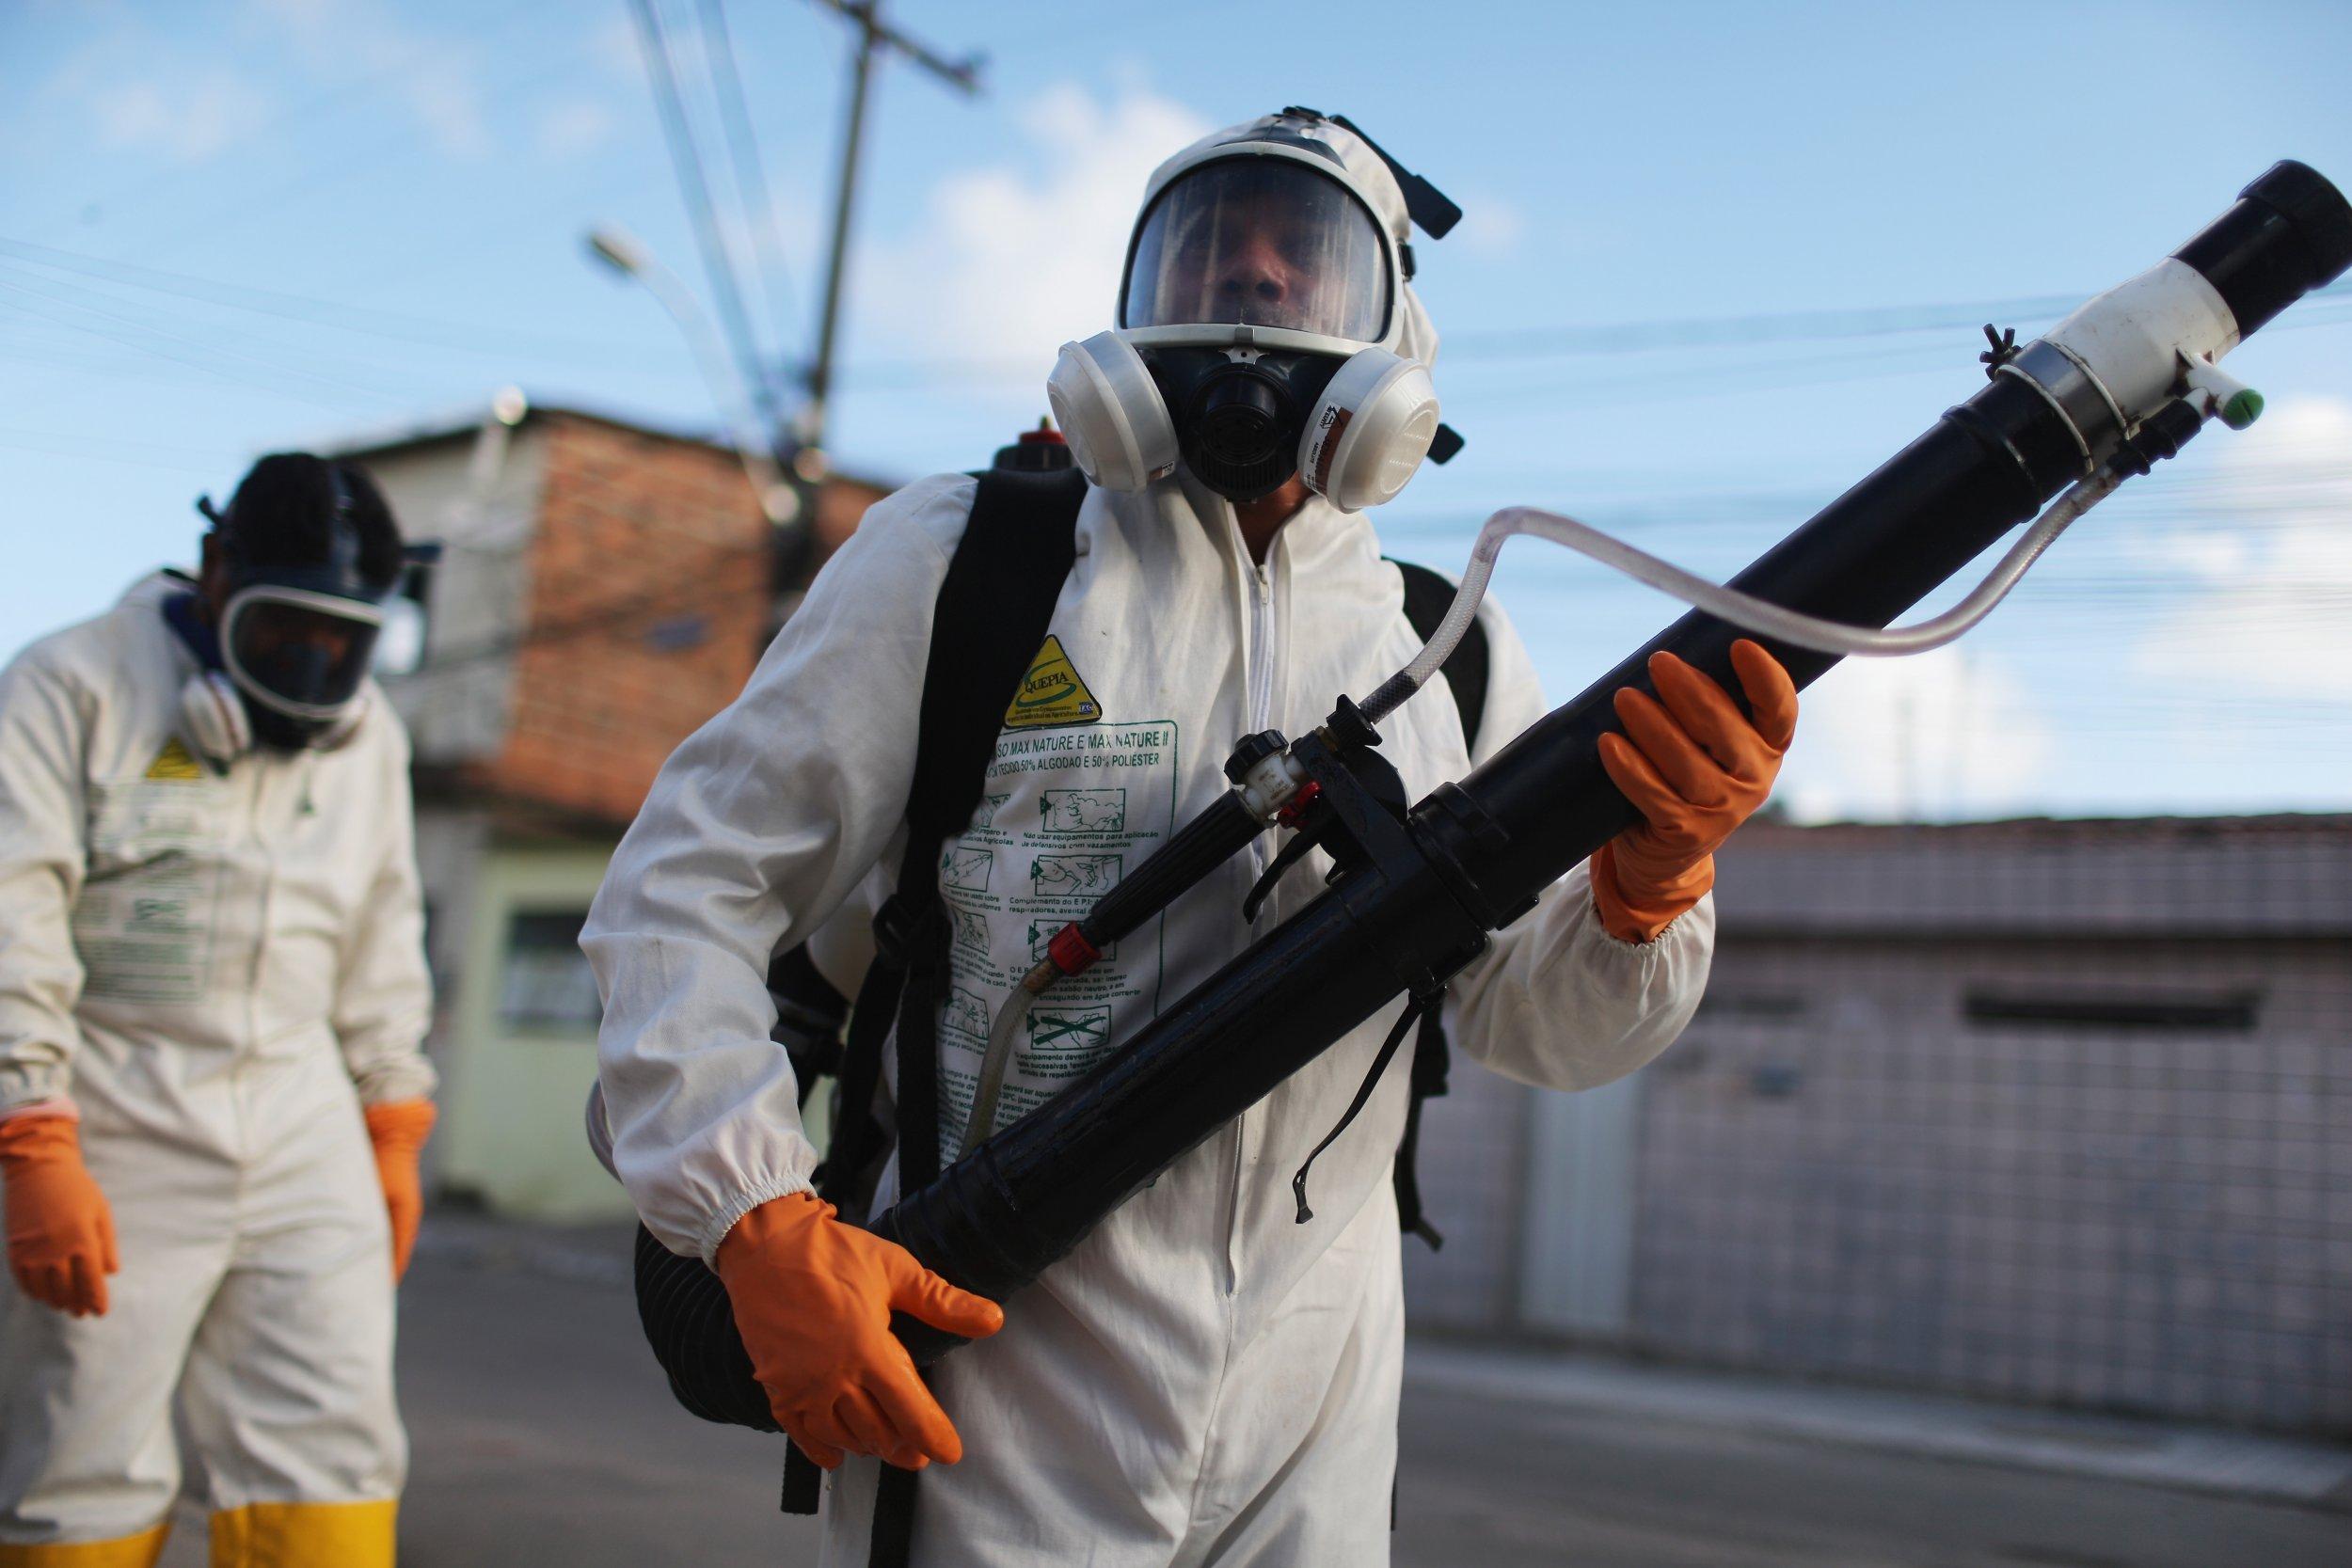 The Zika virus could threaten the Rio 2016 Olympics.